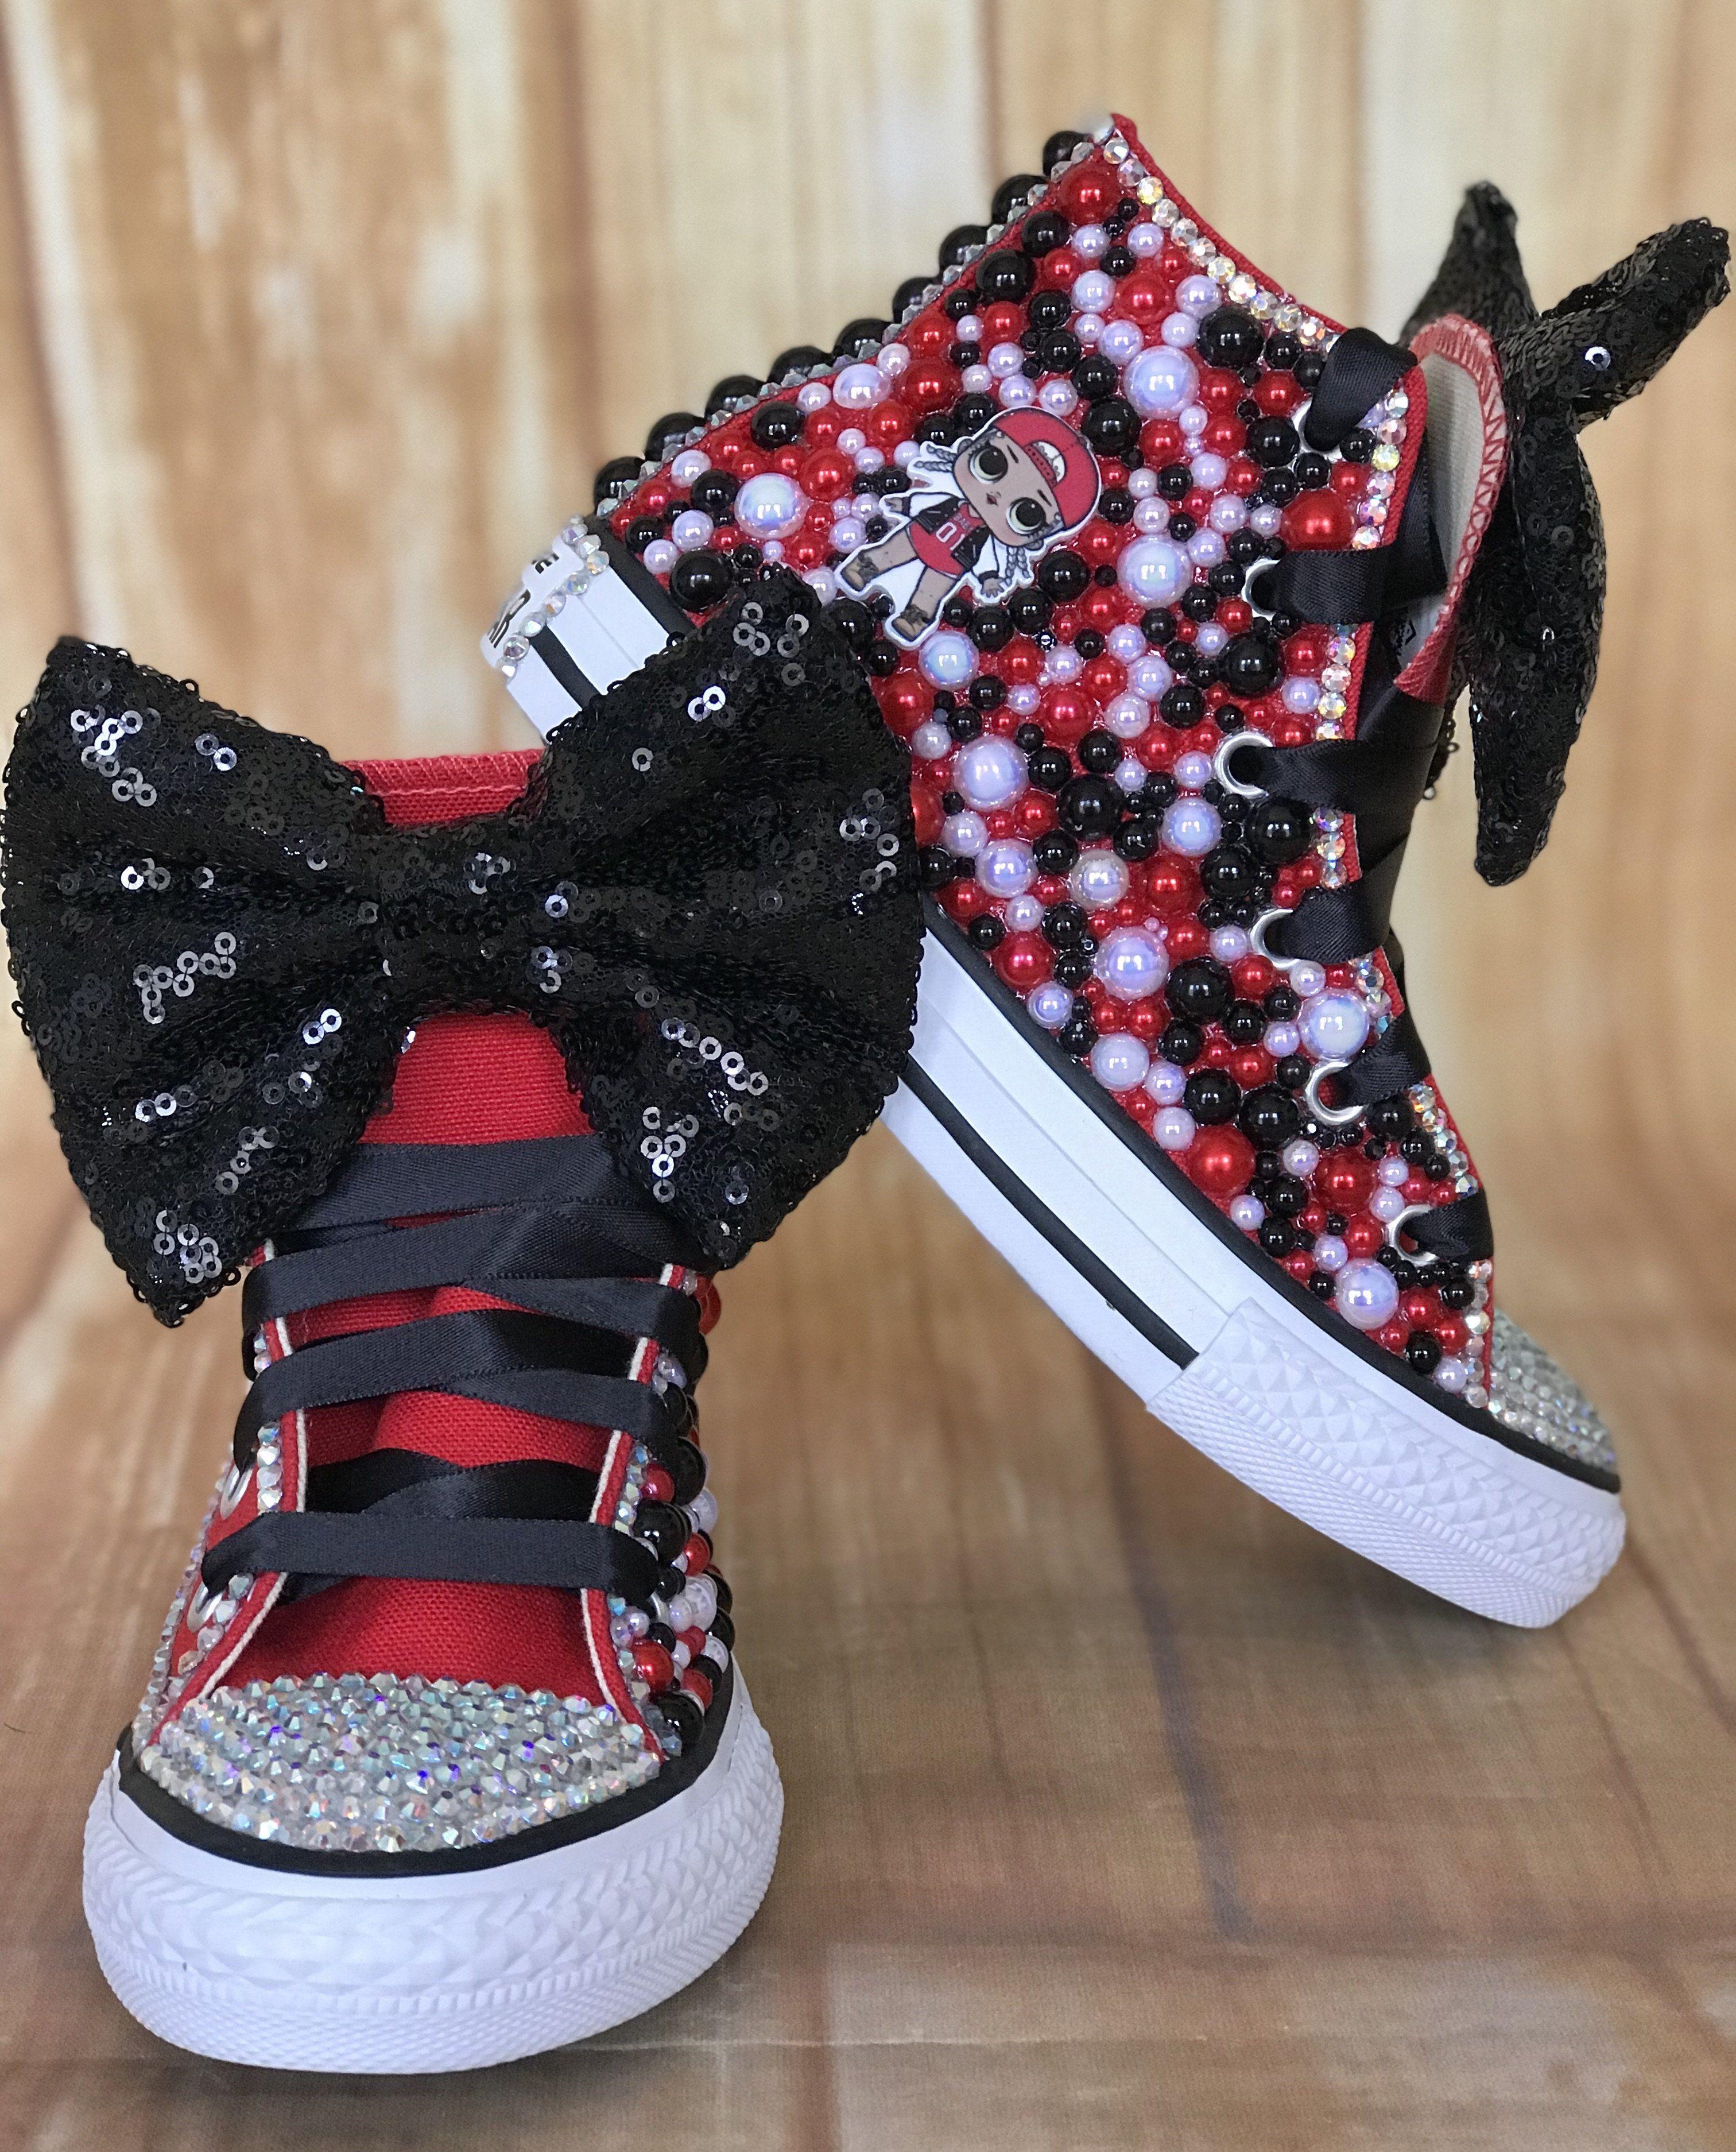 LOL Surprise doll accessories black sneakers